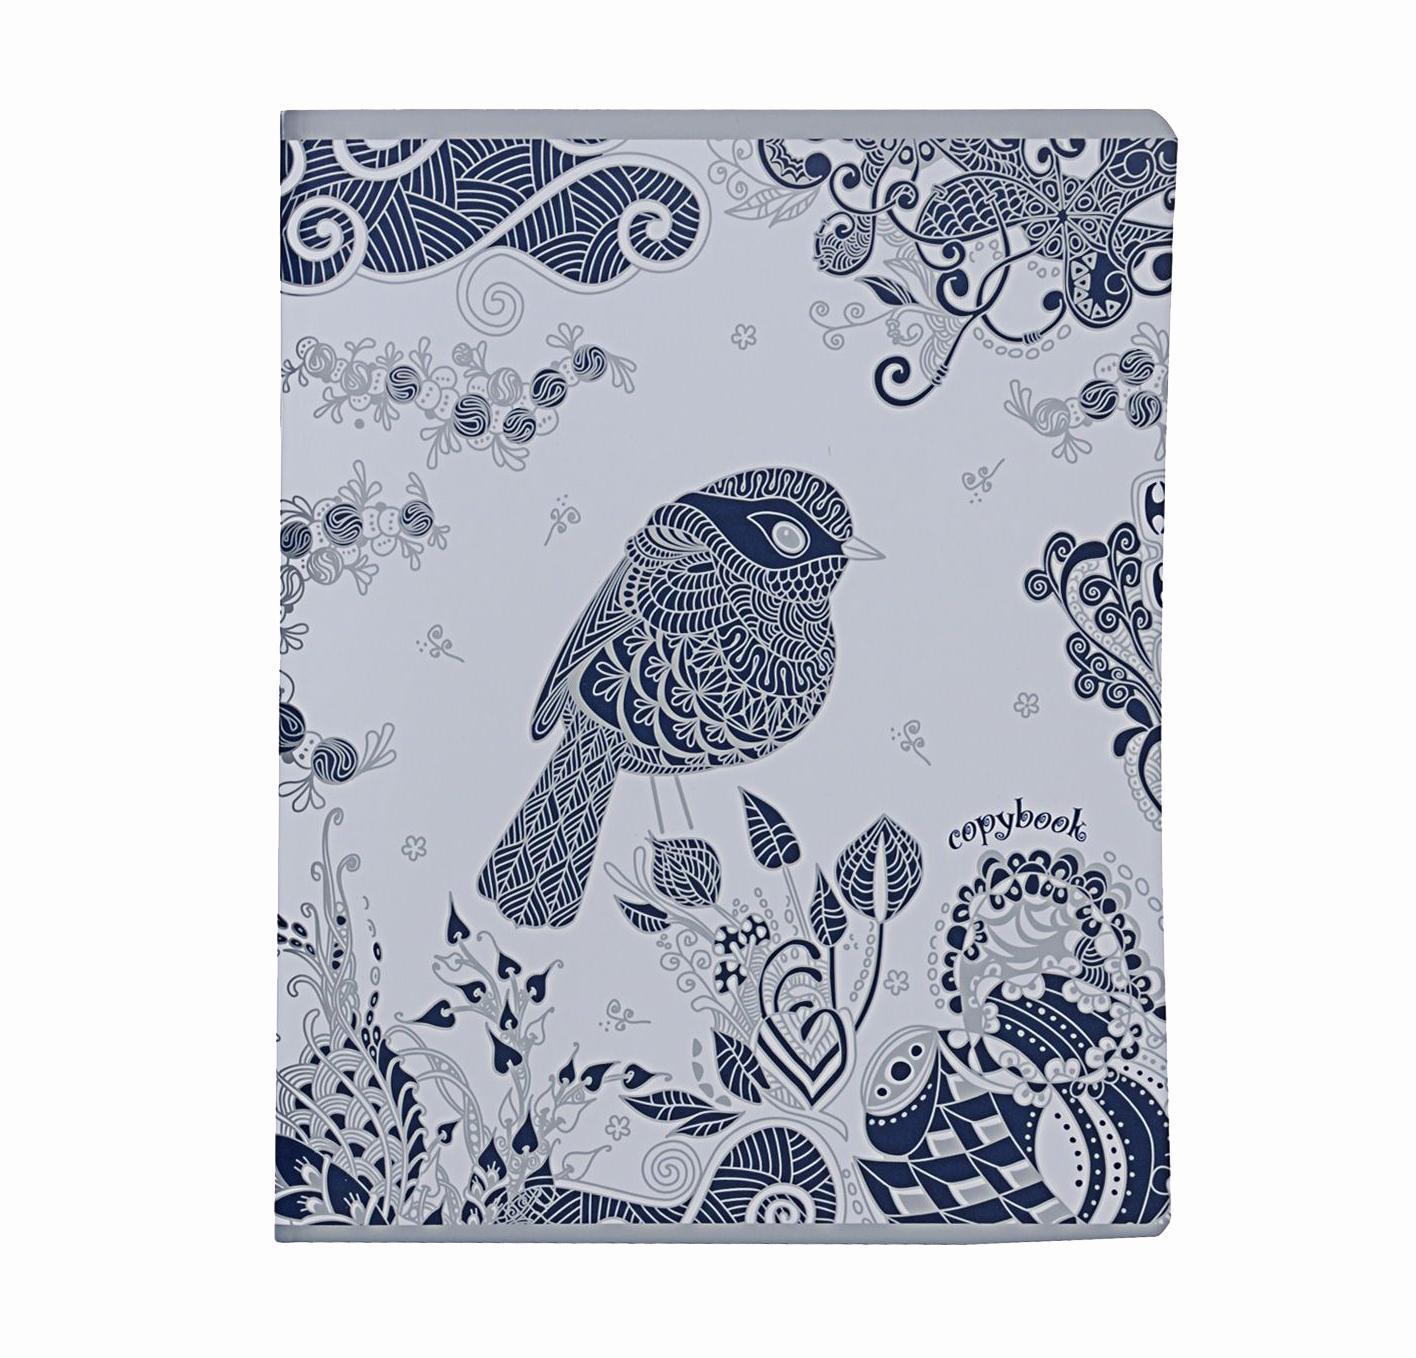 Тетрадь, 96л Сказочные птицы,цвет: белый37603 белыйтетрадь,96л Сказочные птицы, цвет: белый